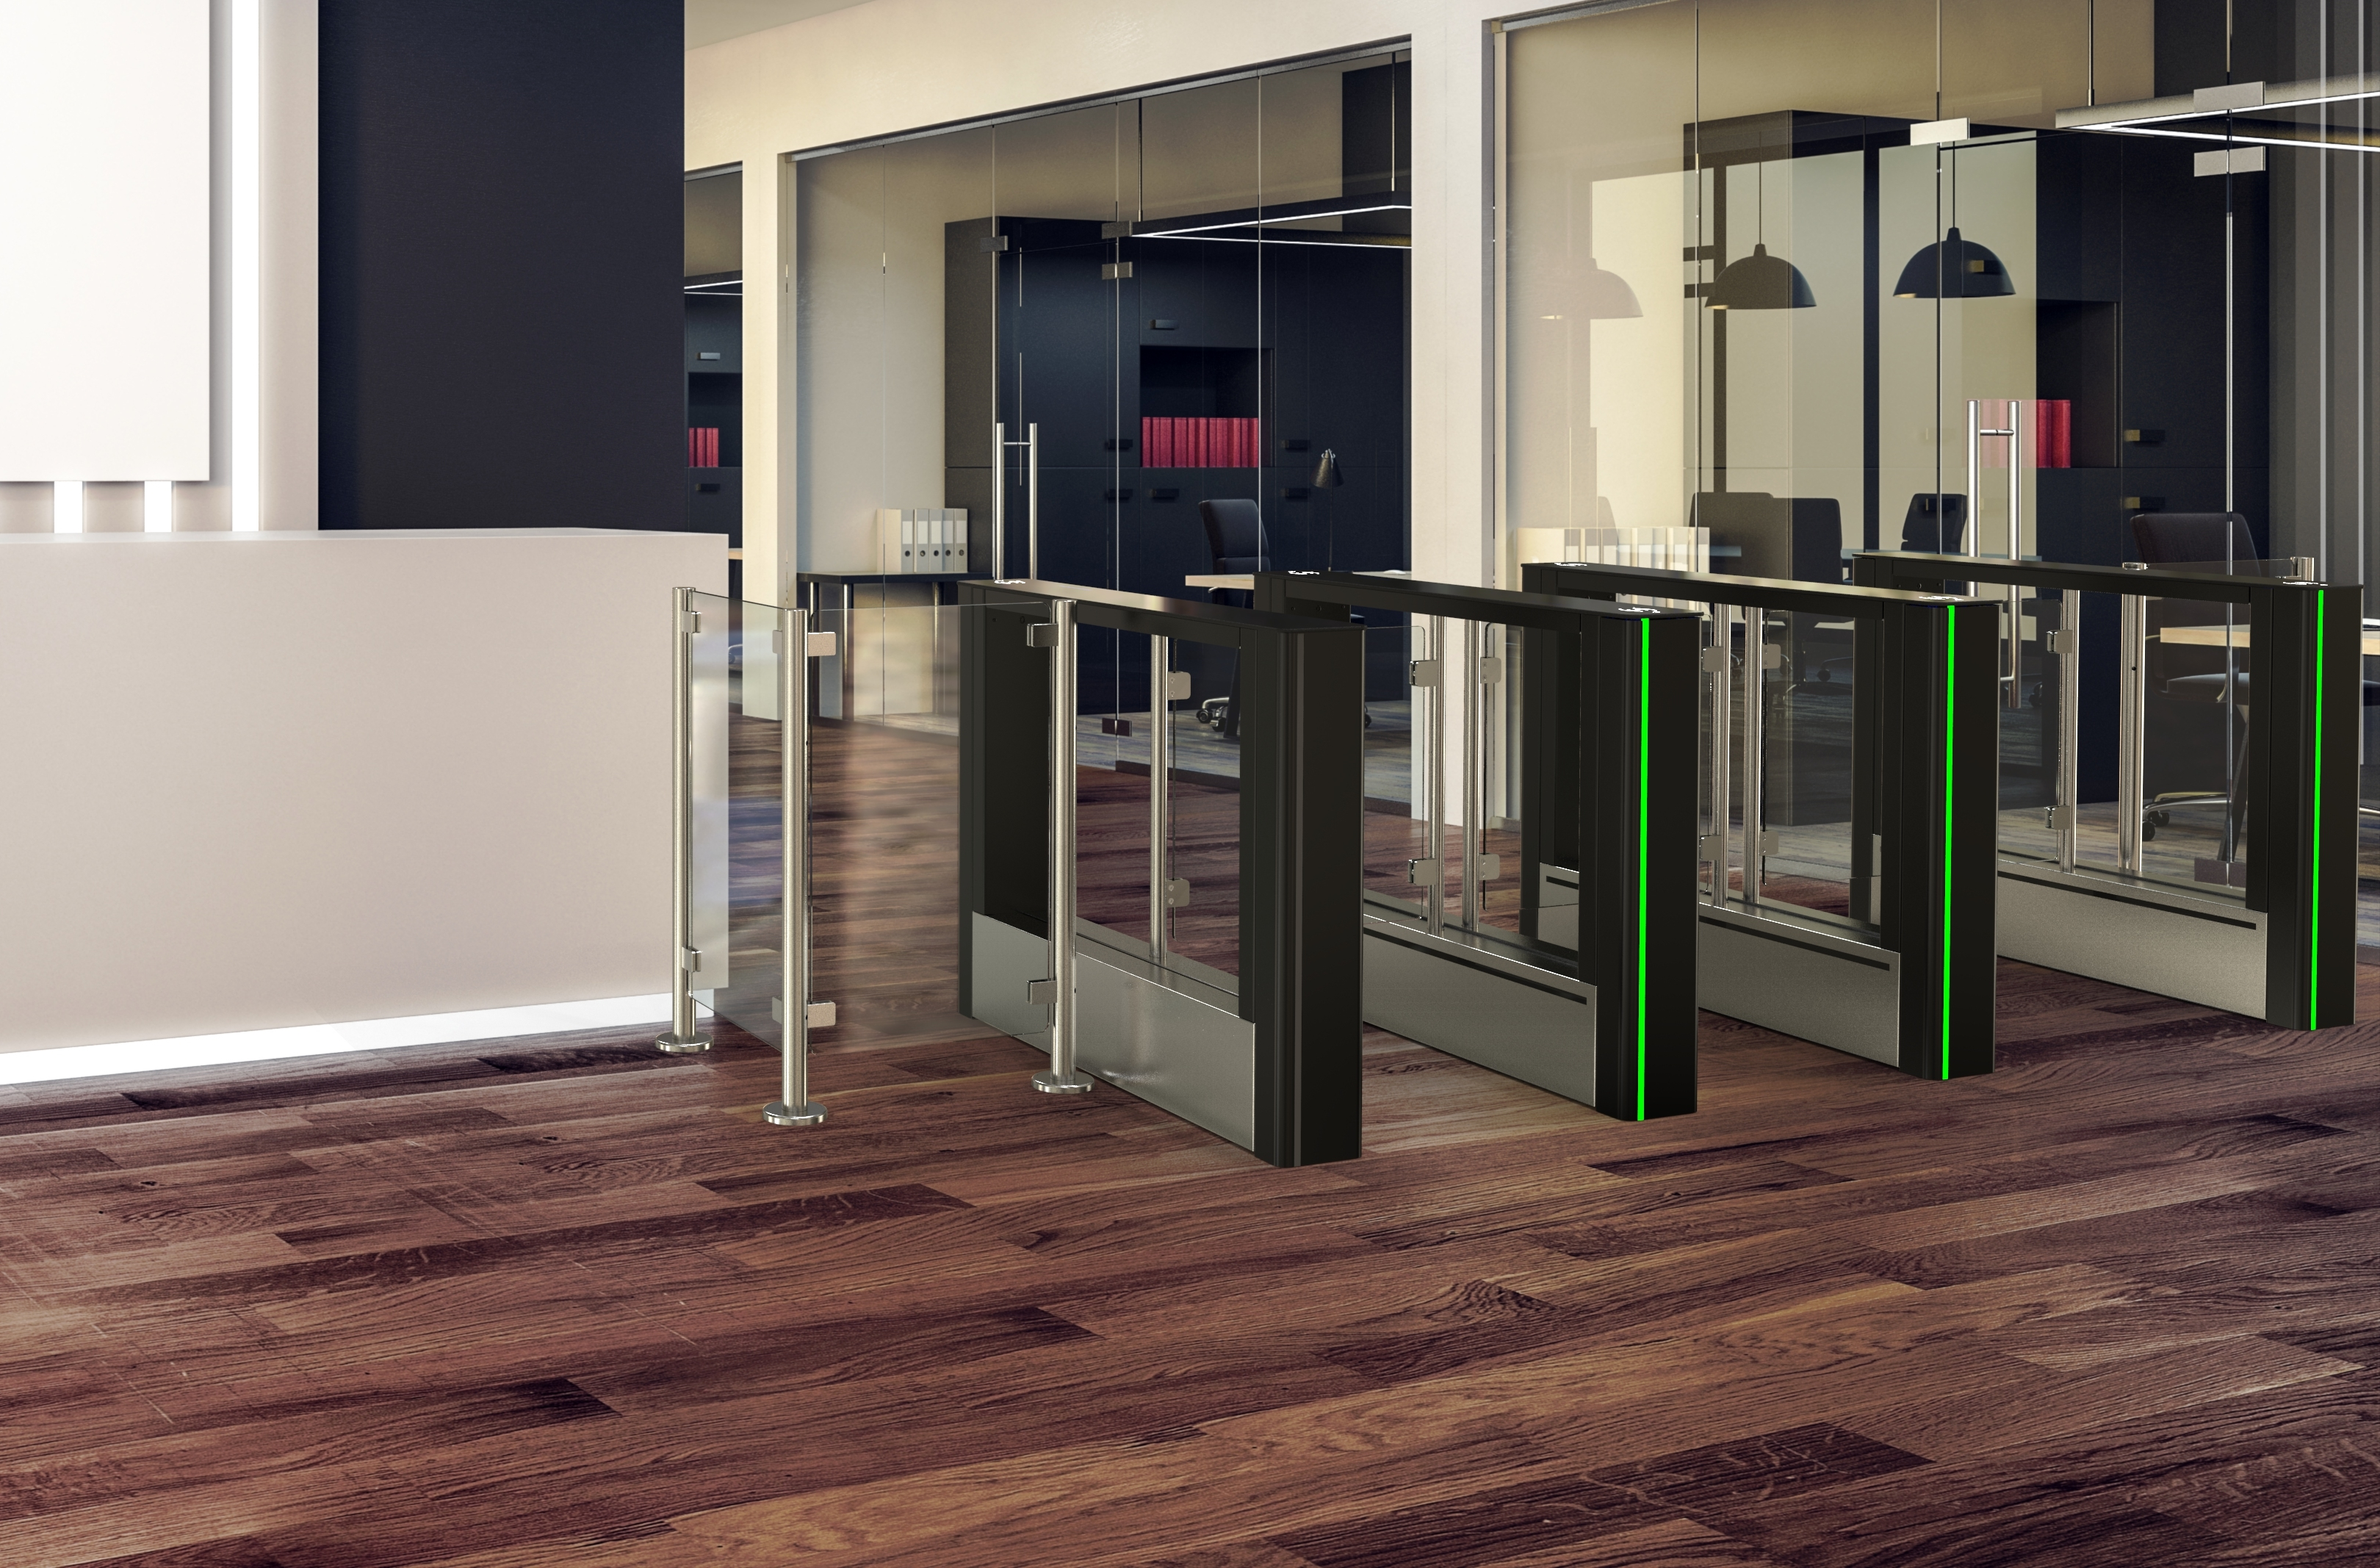 firstlane-security-turnstiles